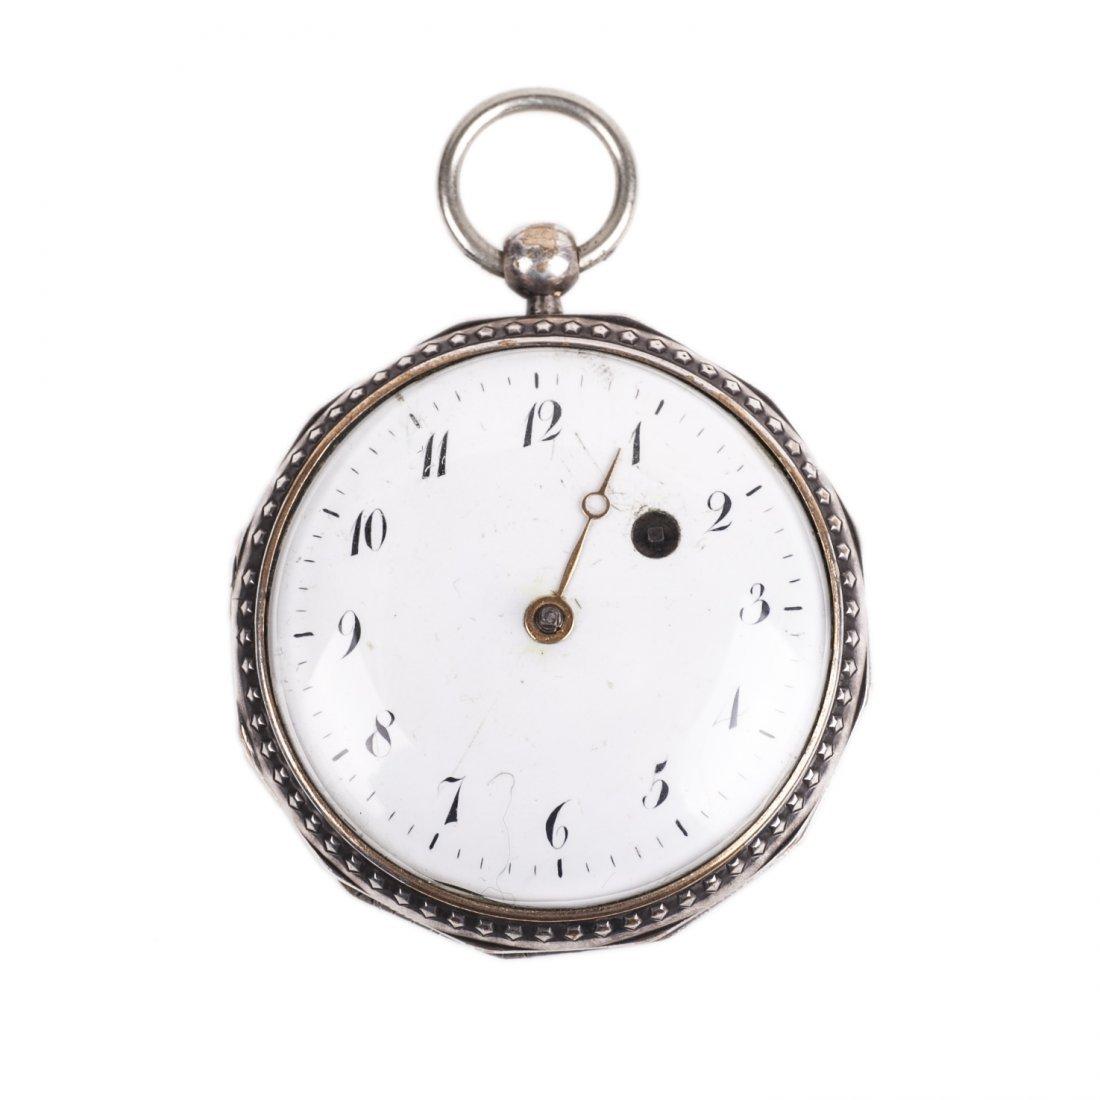 18th century English pocket watch